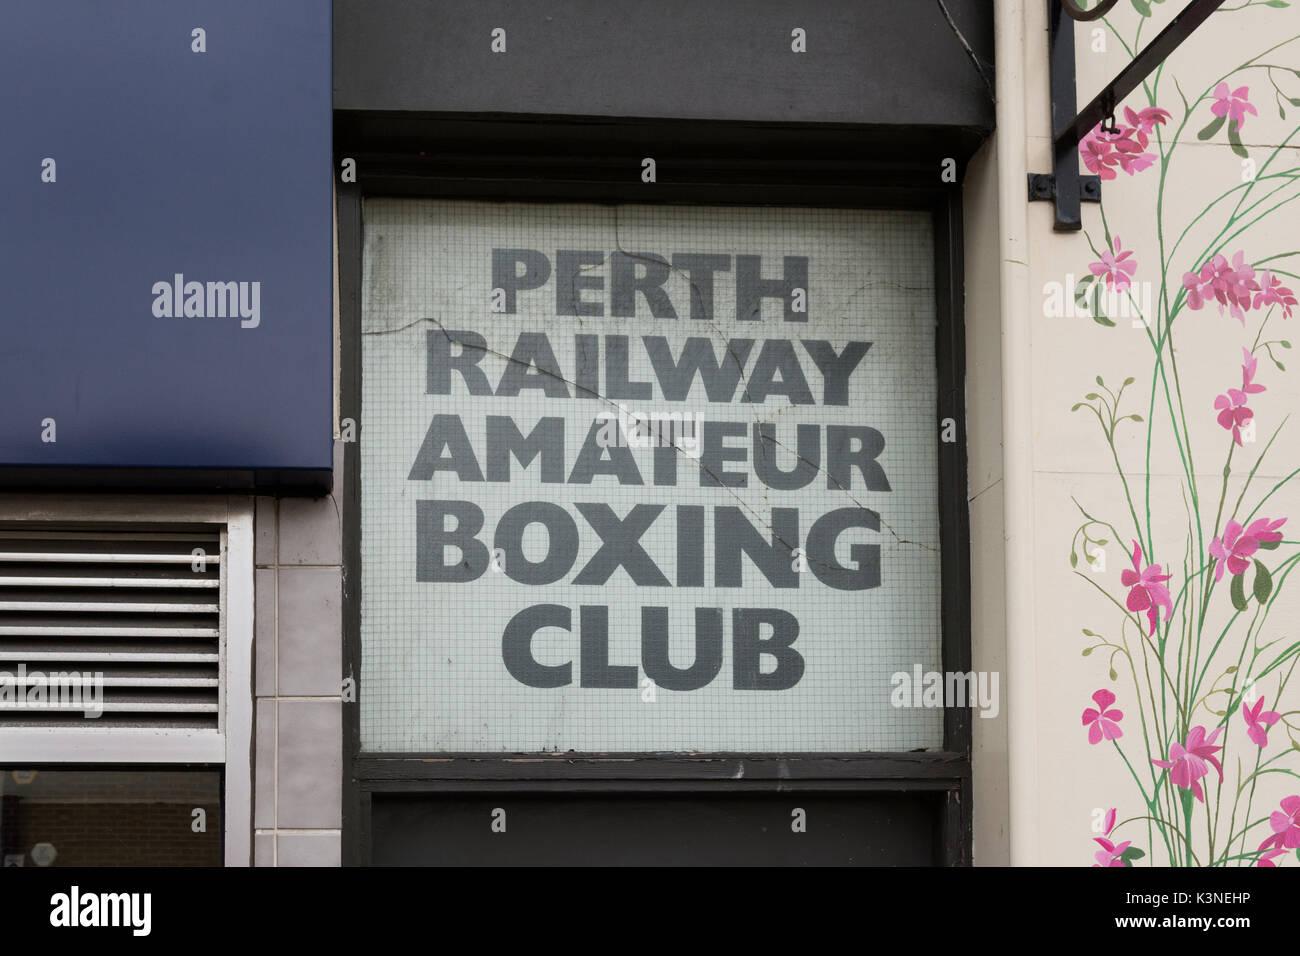 Perth Railway Amateur Boxing Club sign, South Methven Street, Perth, Scotland, UK - Stock Image